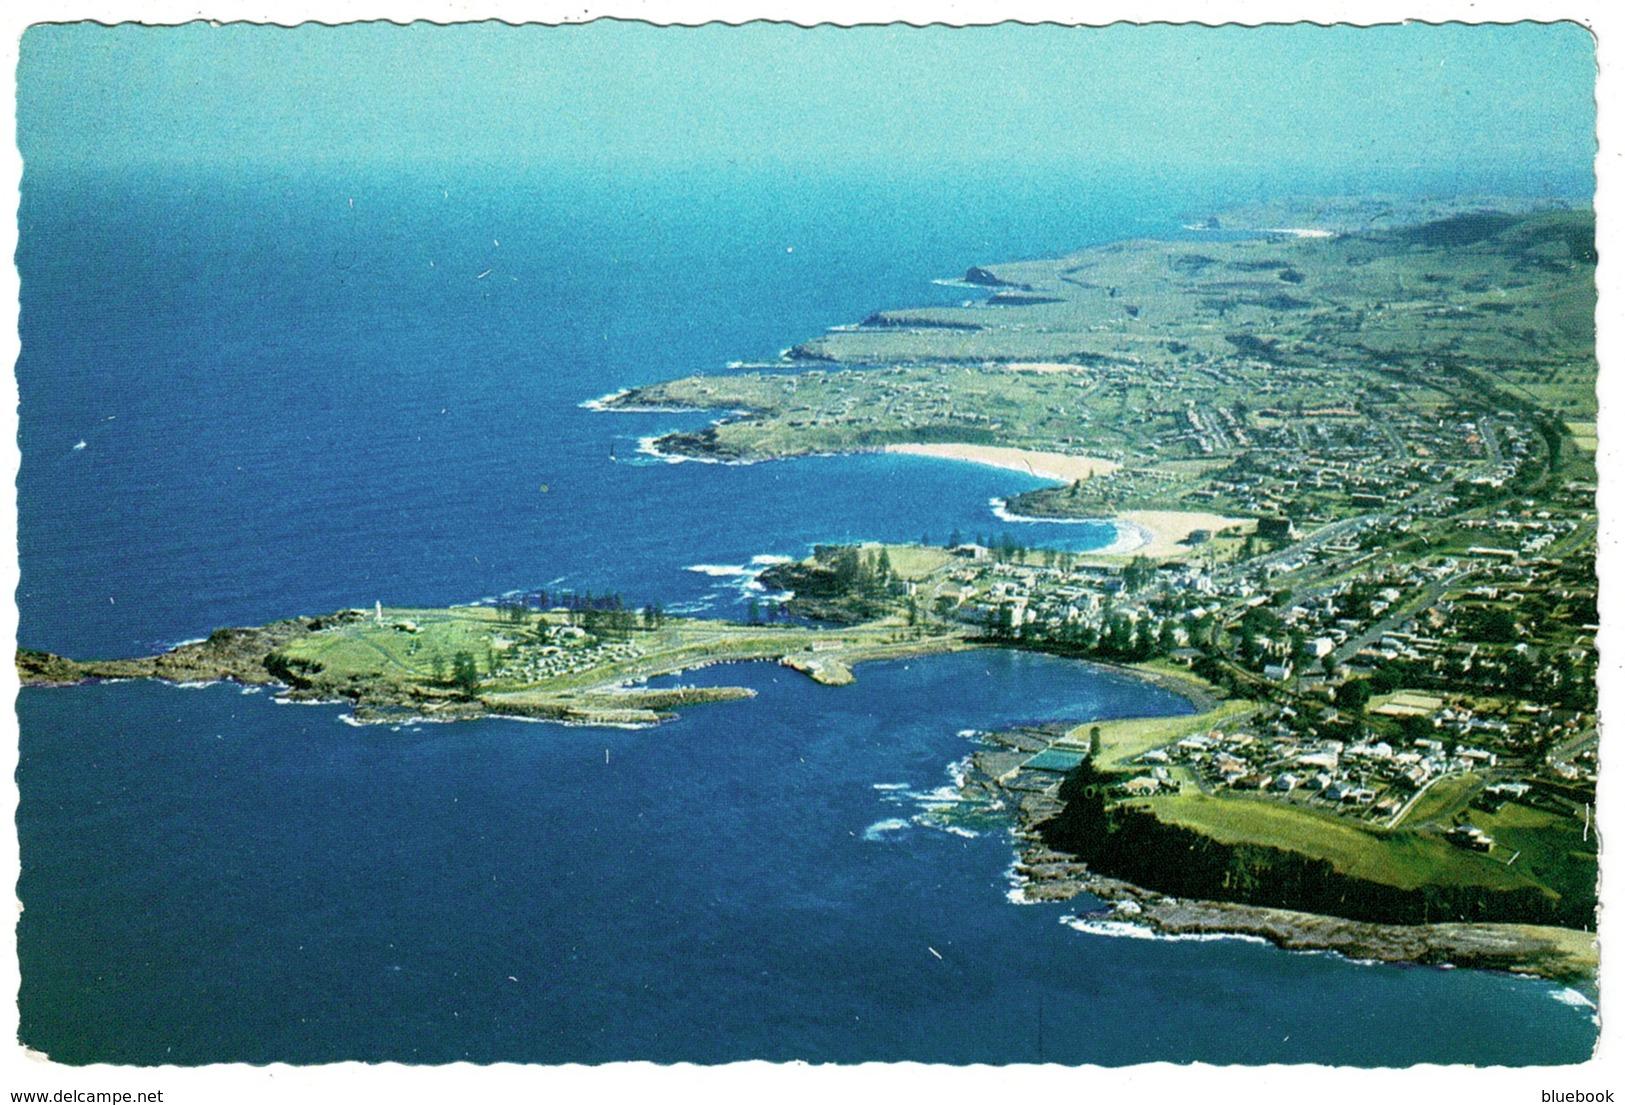 Ref 1260 - Postcard - Kiama From The North - New South Wales - Australia - Australie